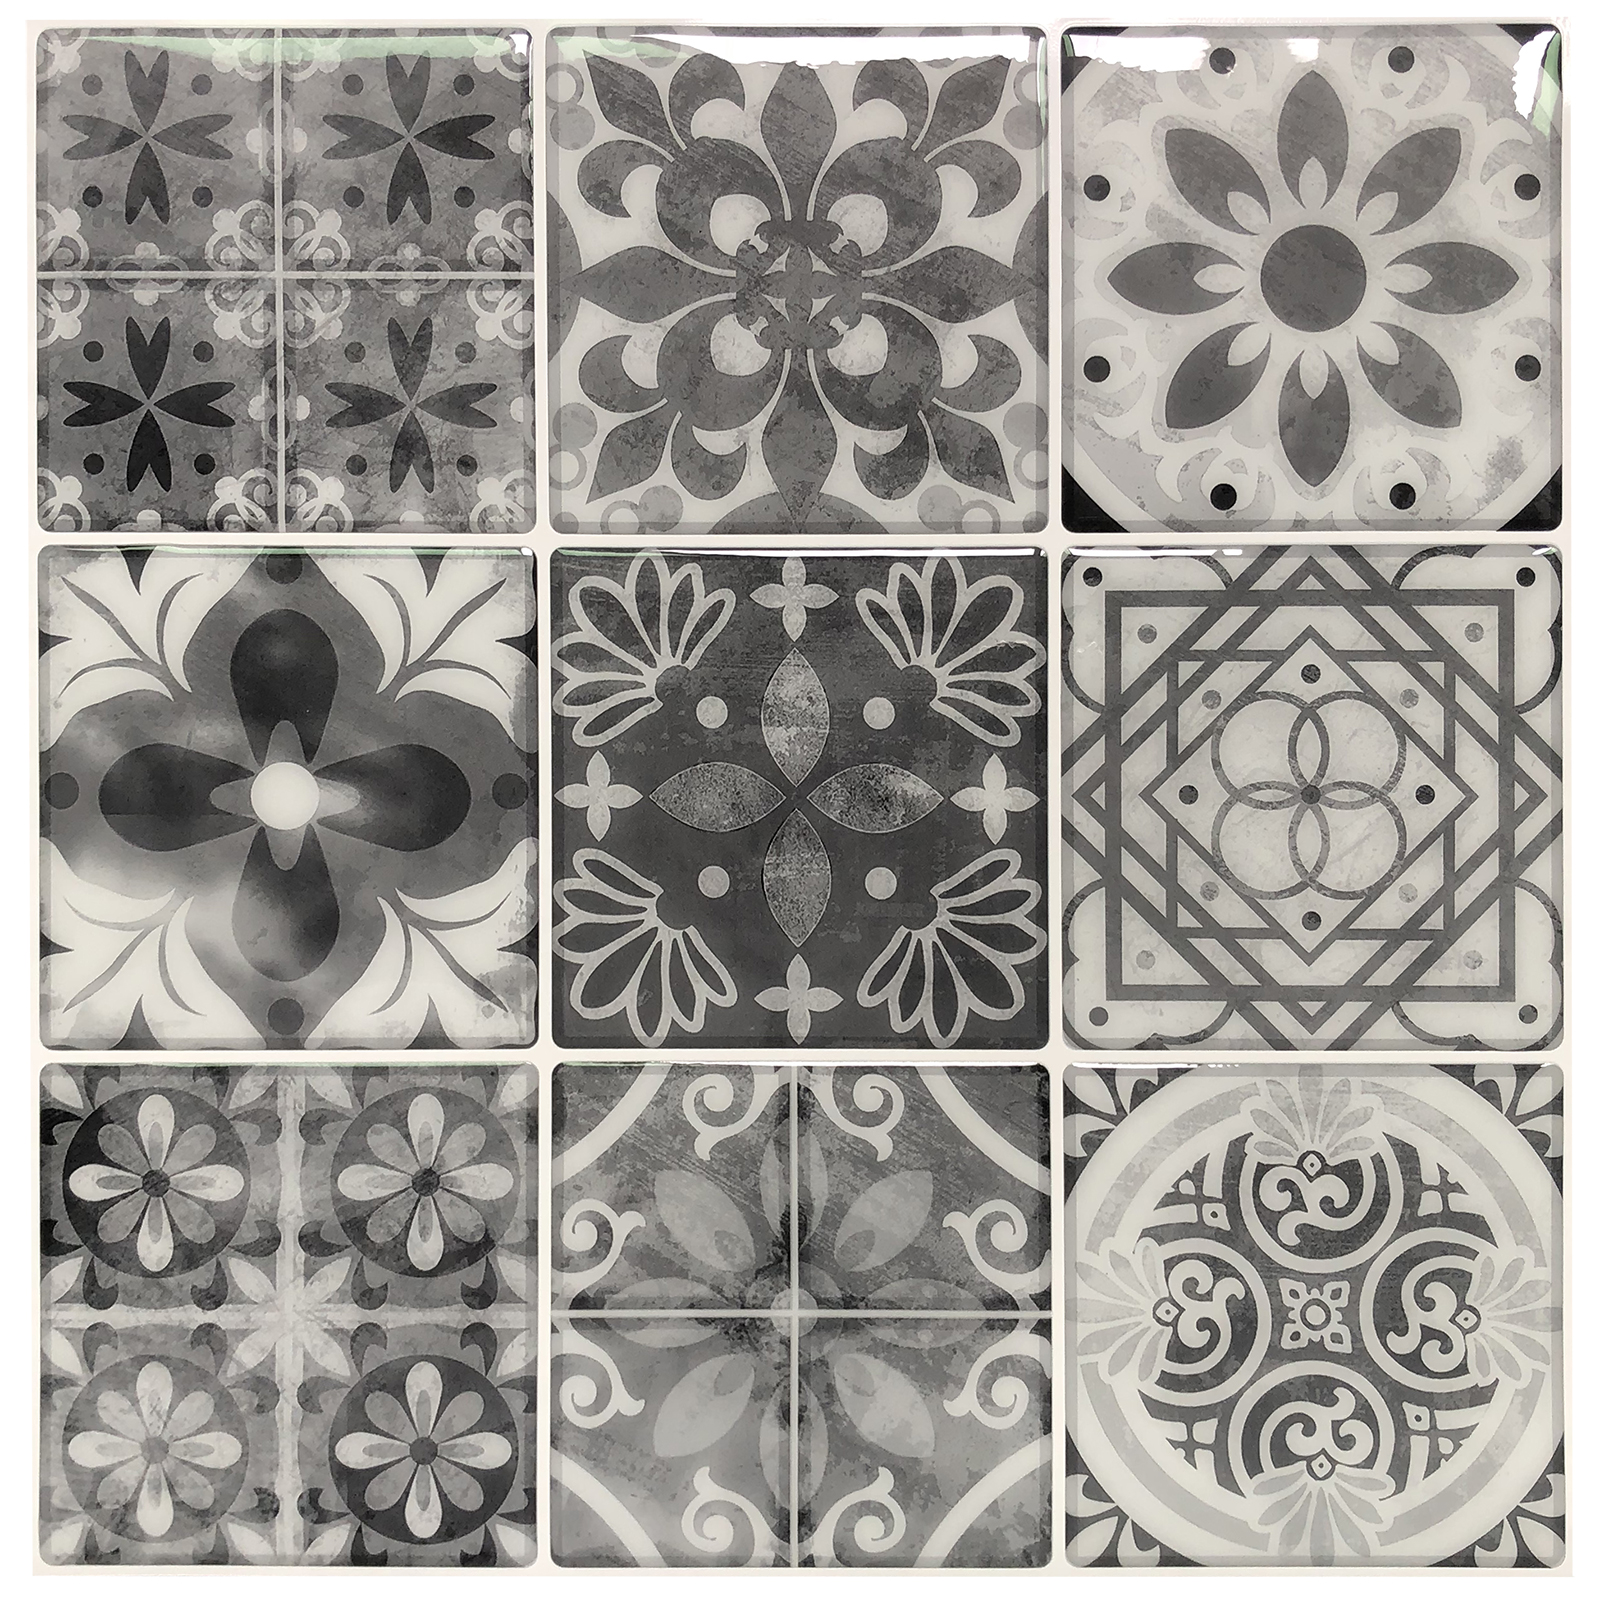 longking peel and stick wall tile backsplash tile gray talavera 12 in x 12 in 10 pack